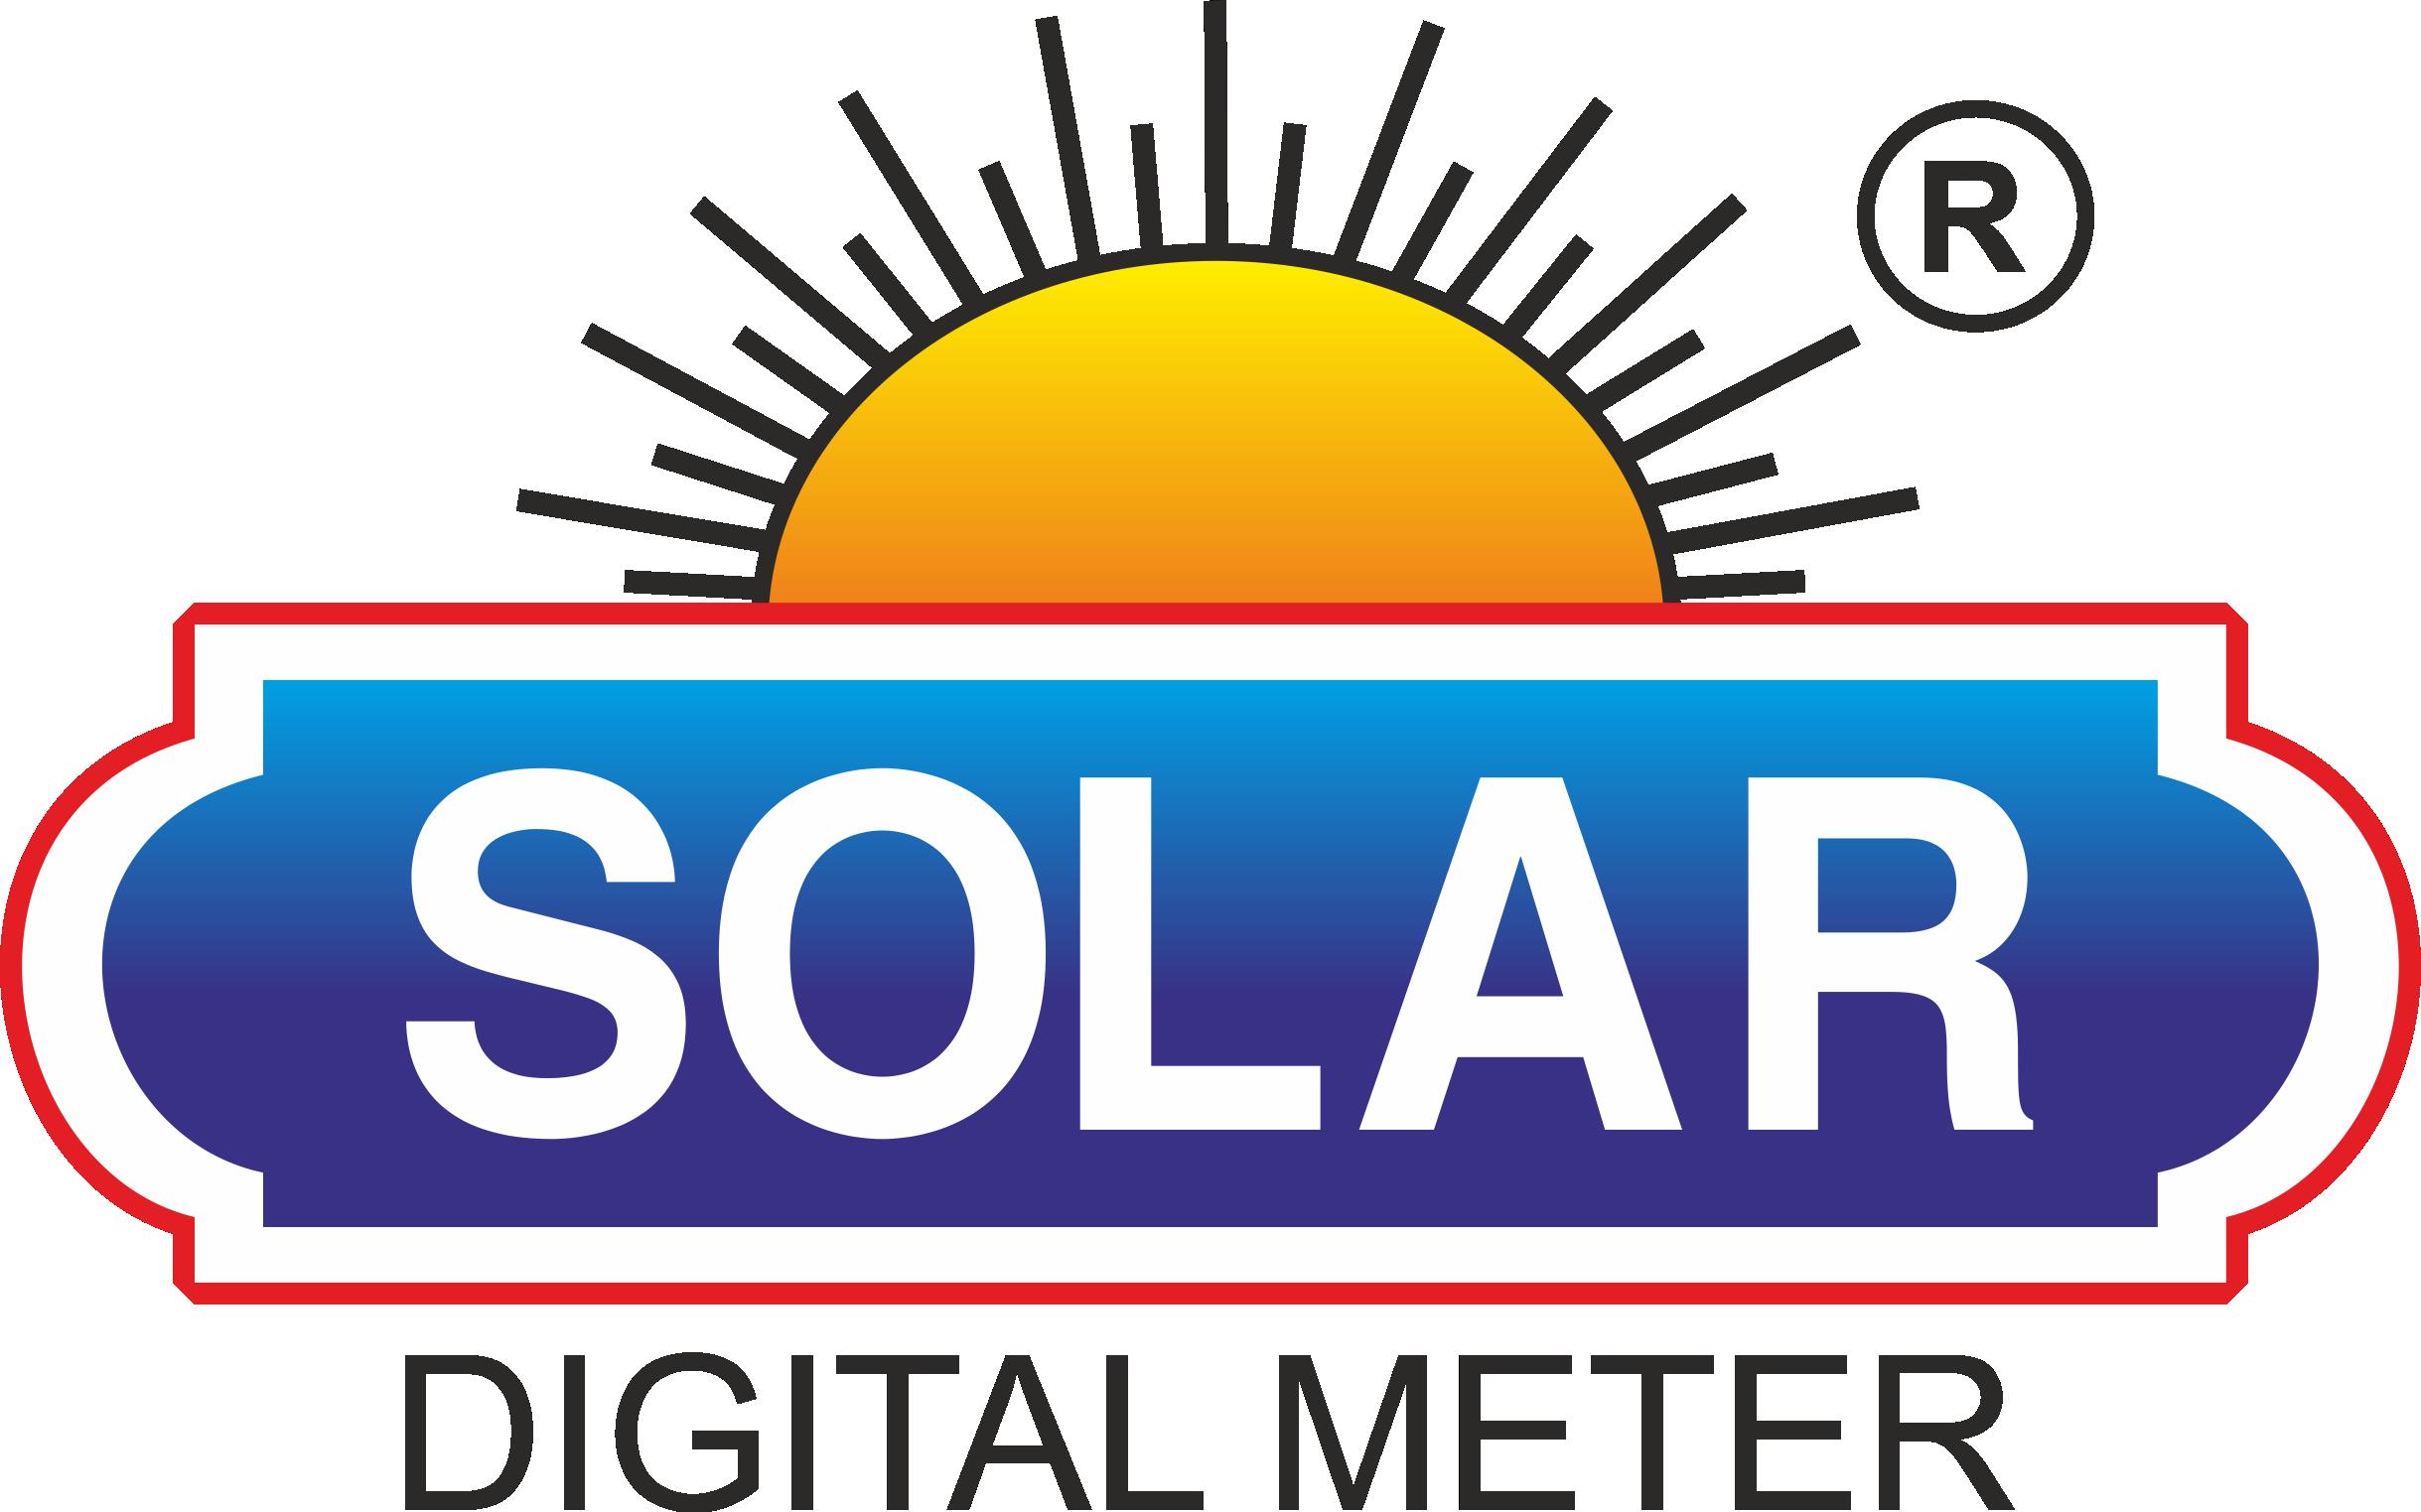 SOLAR DIGITAL METER